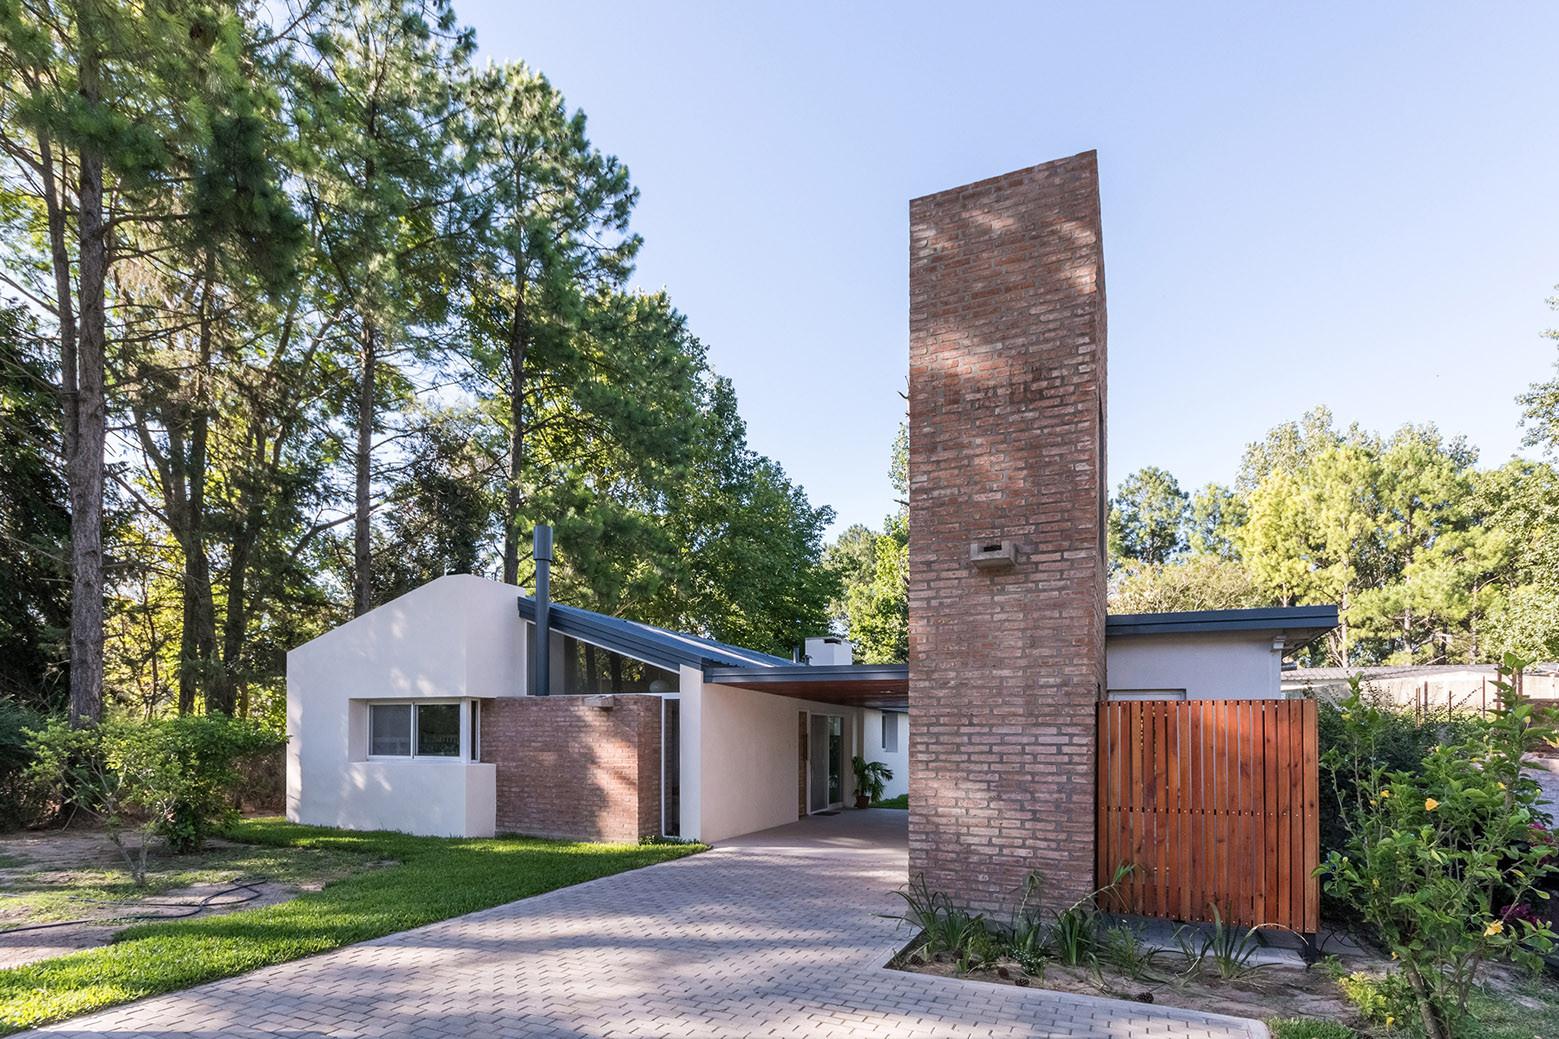 Casa en El Pinar / BIAGIONI/PECORARI Arquitectos, © Ramiro Sosa